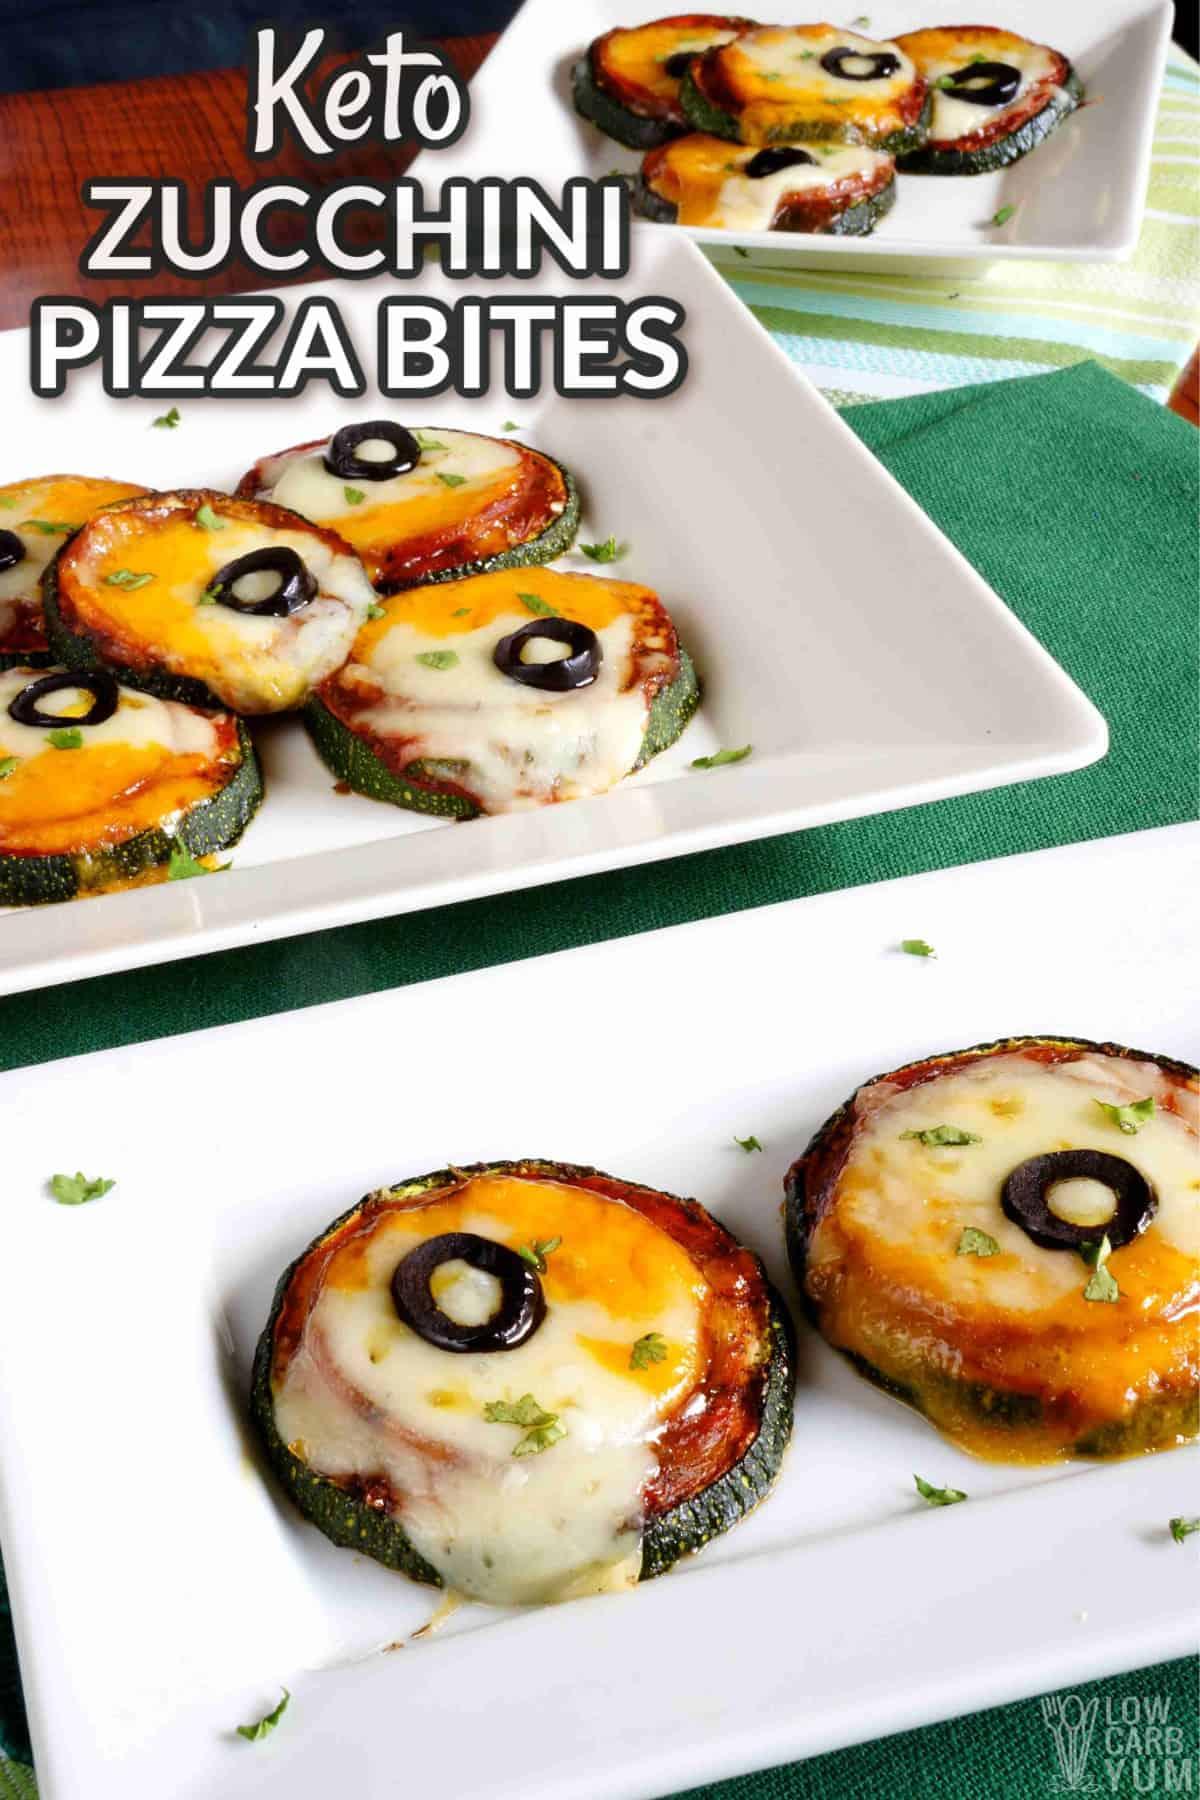 keto zucchini pizza bites cover image